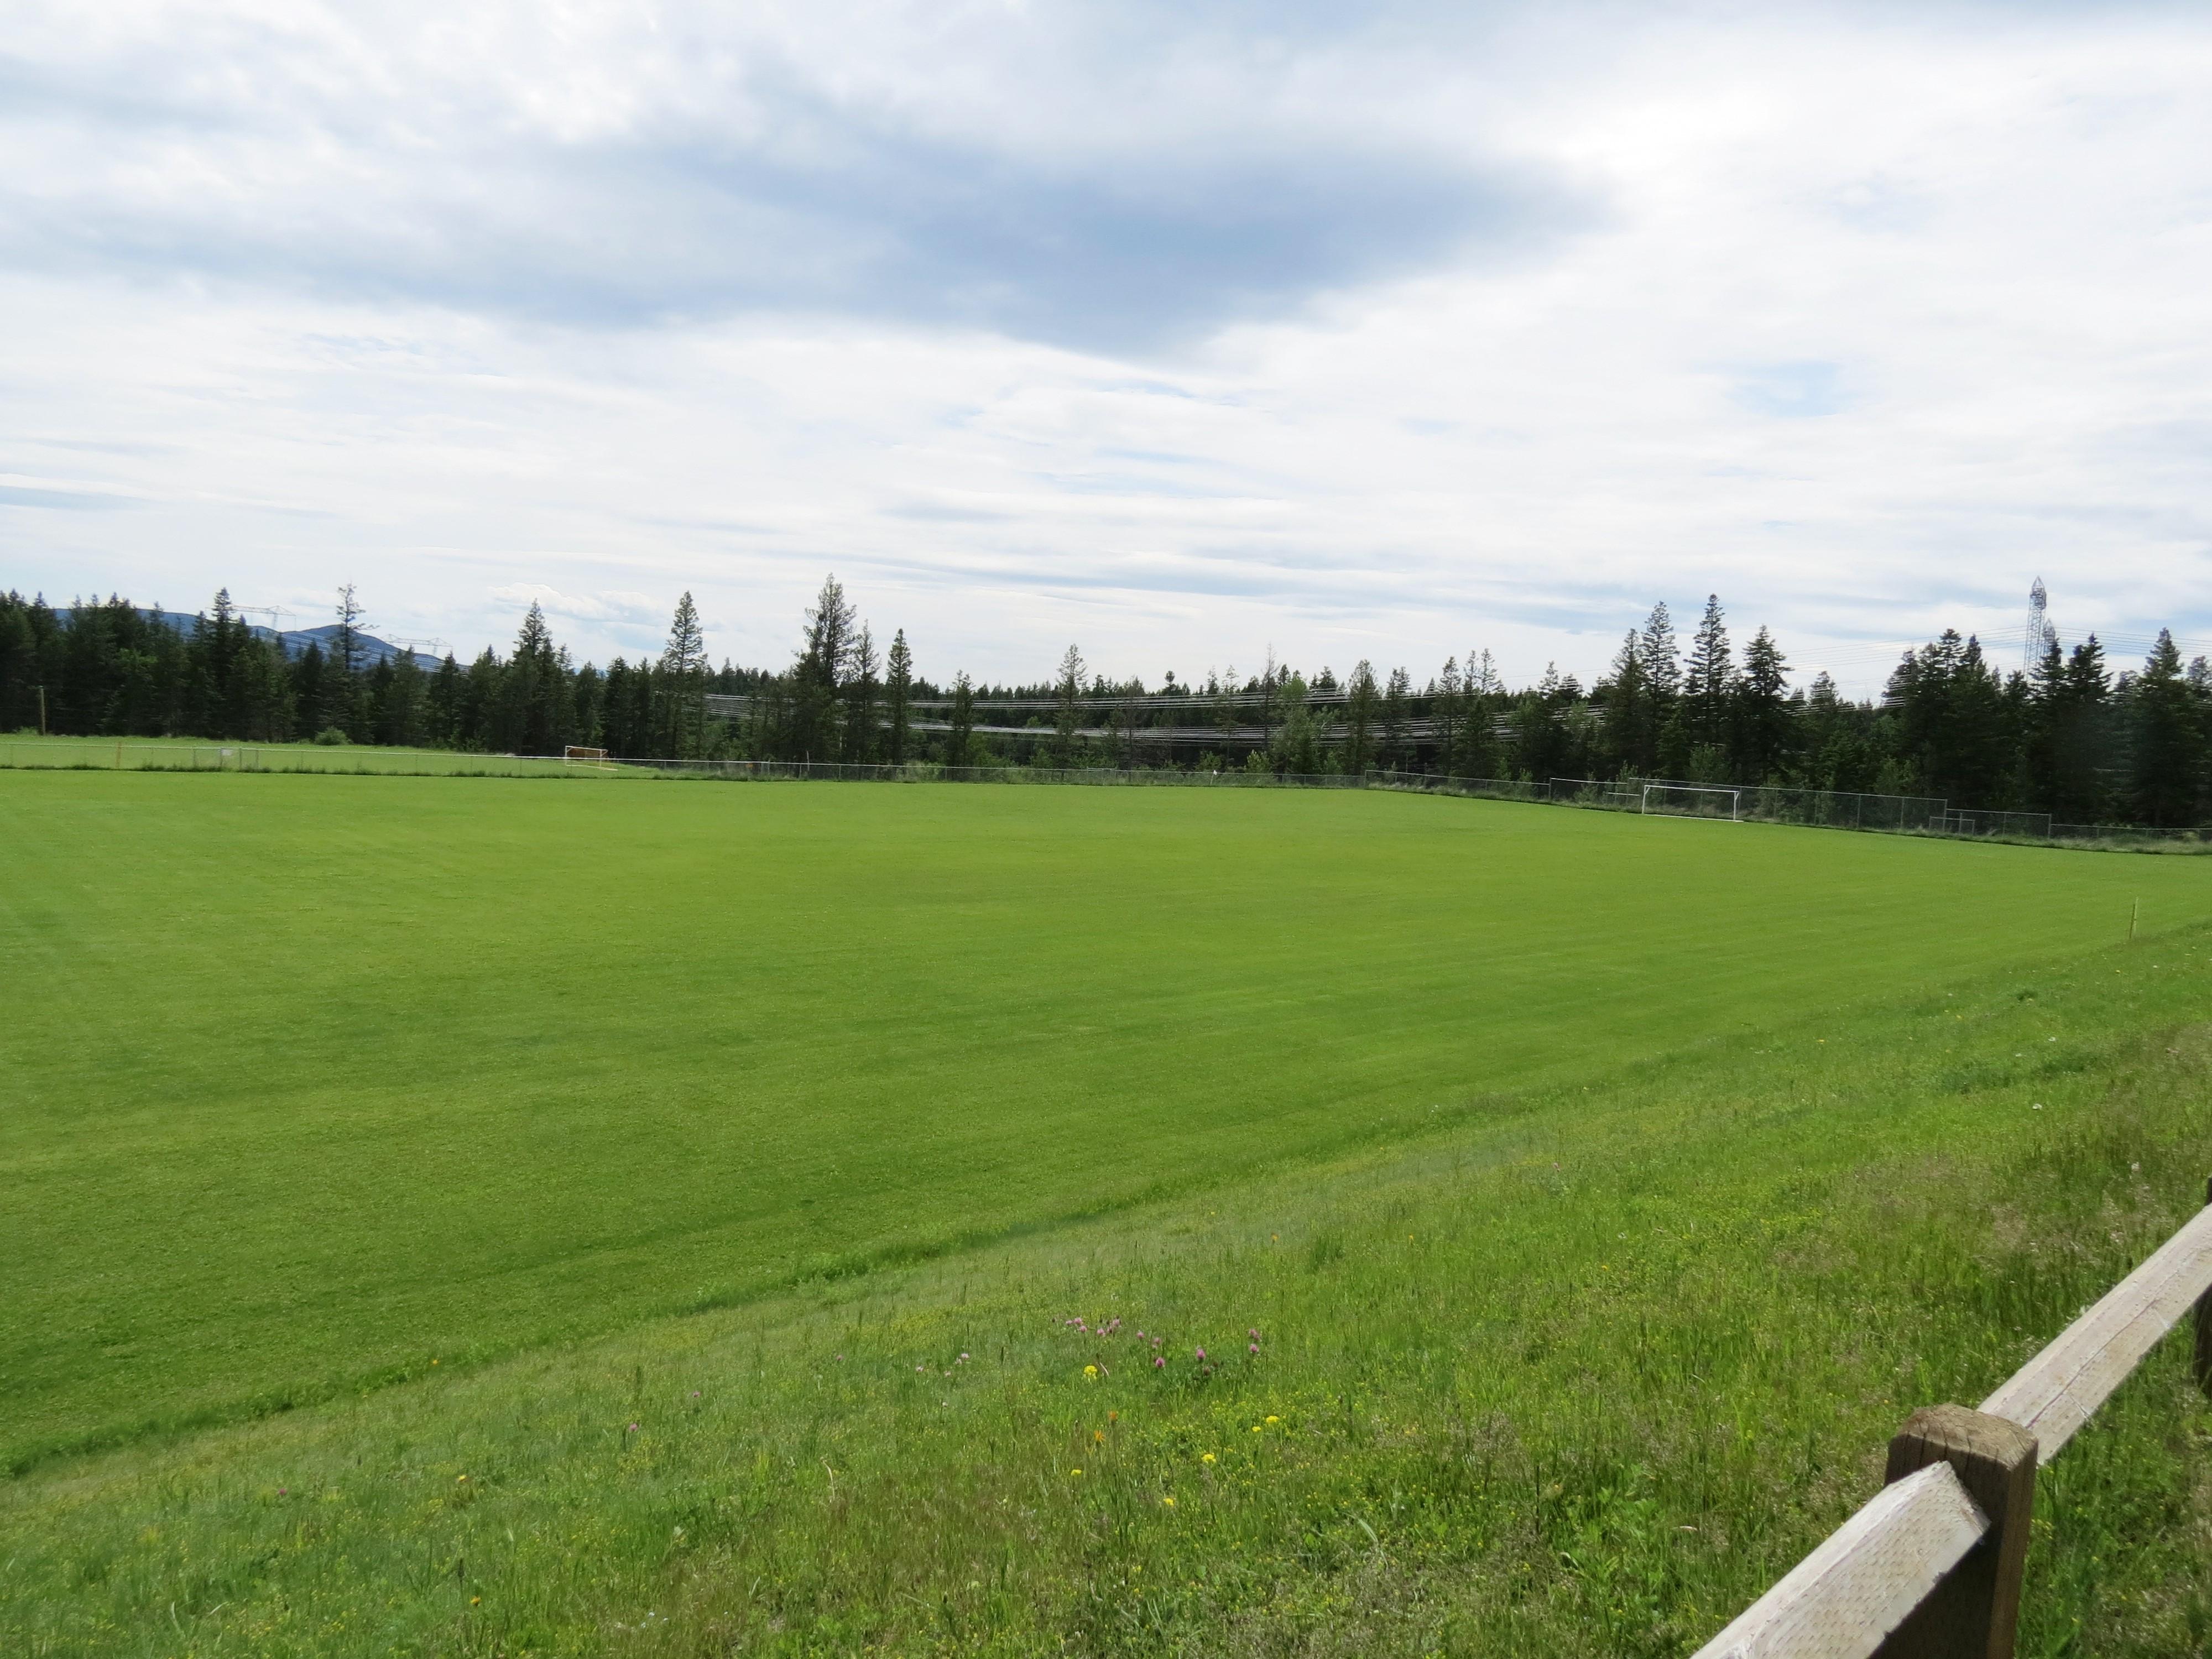 Scotiabank Field